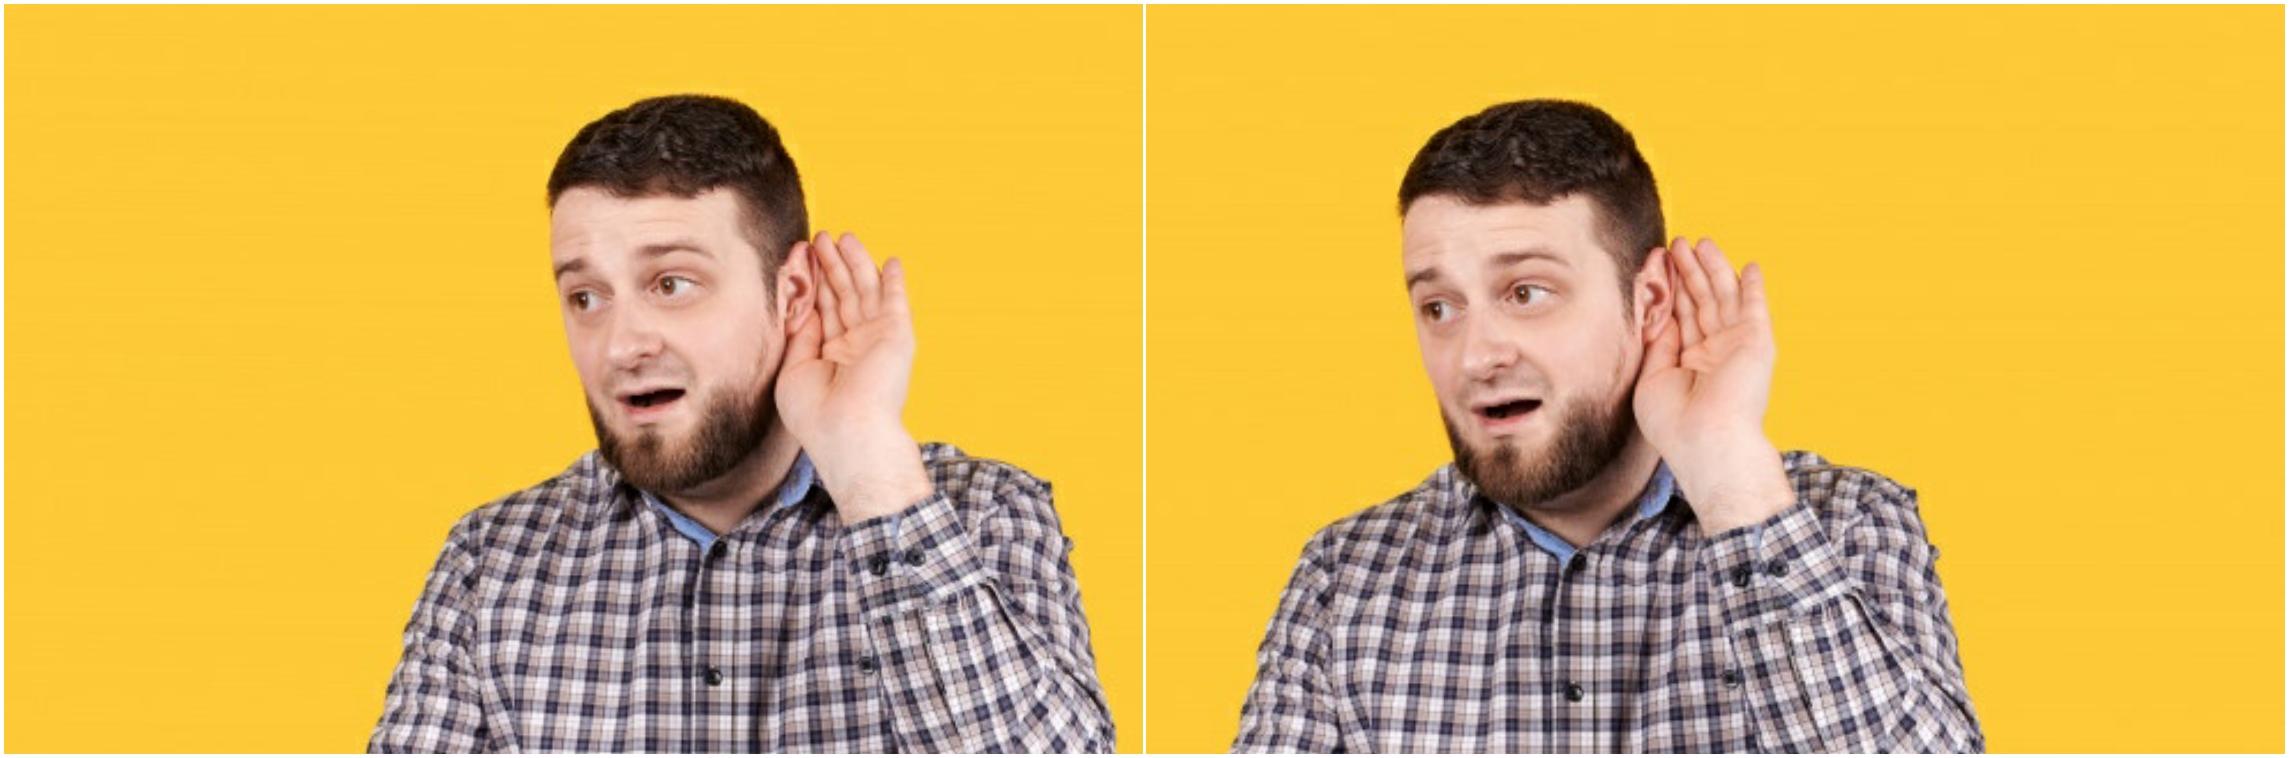 Cara mengatasi gangguan telinga saat naik pesawat